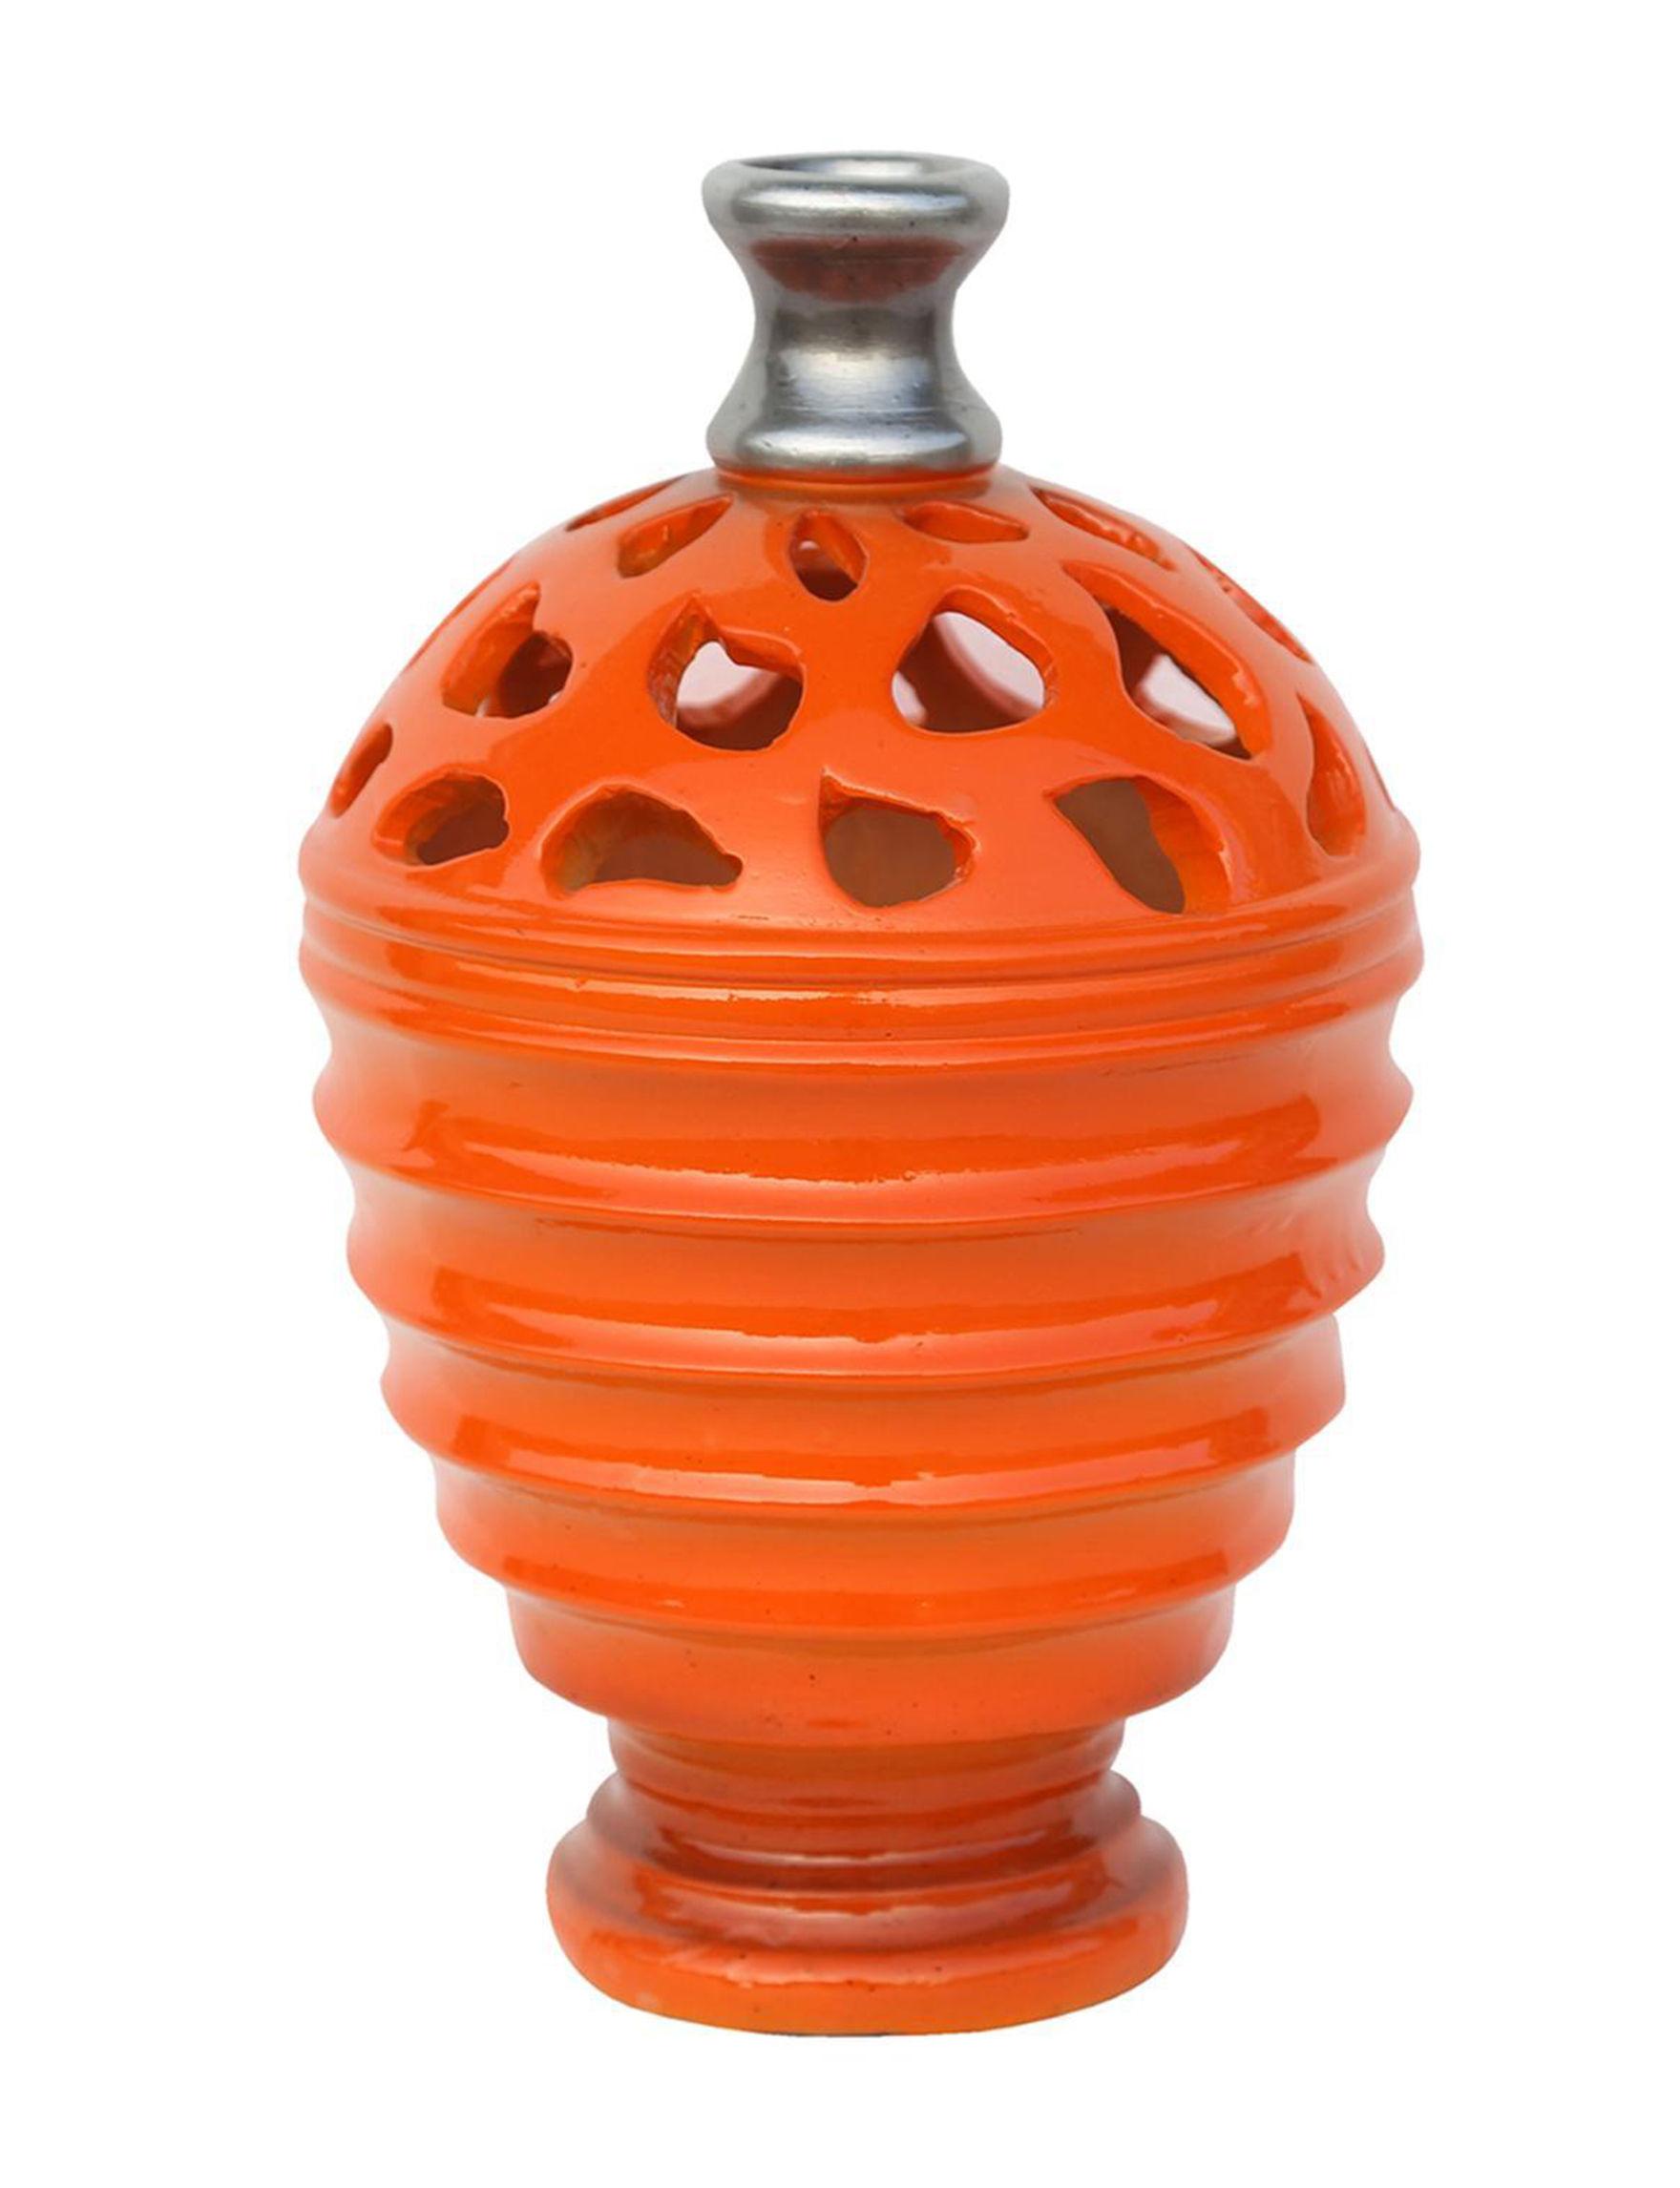 Northlight Orange Decorative Objects Outdoor Decor